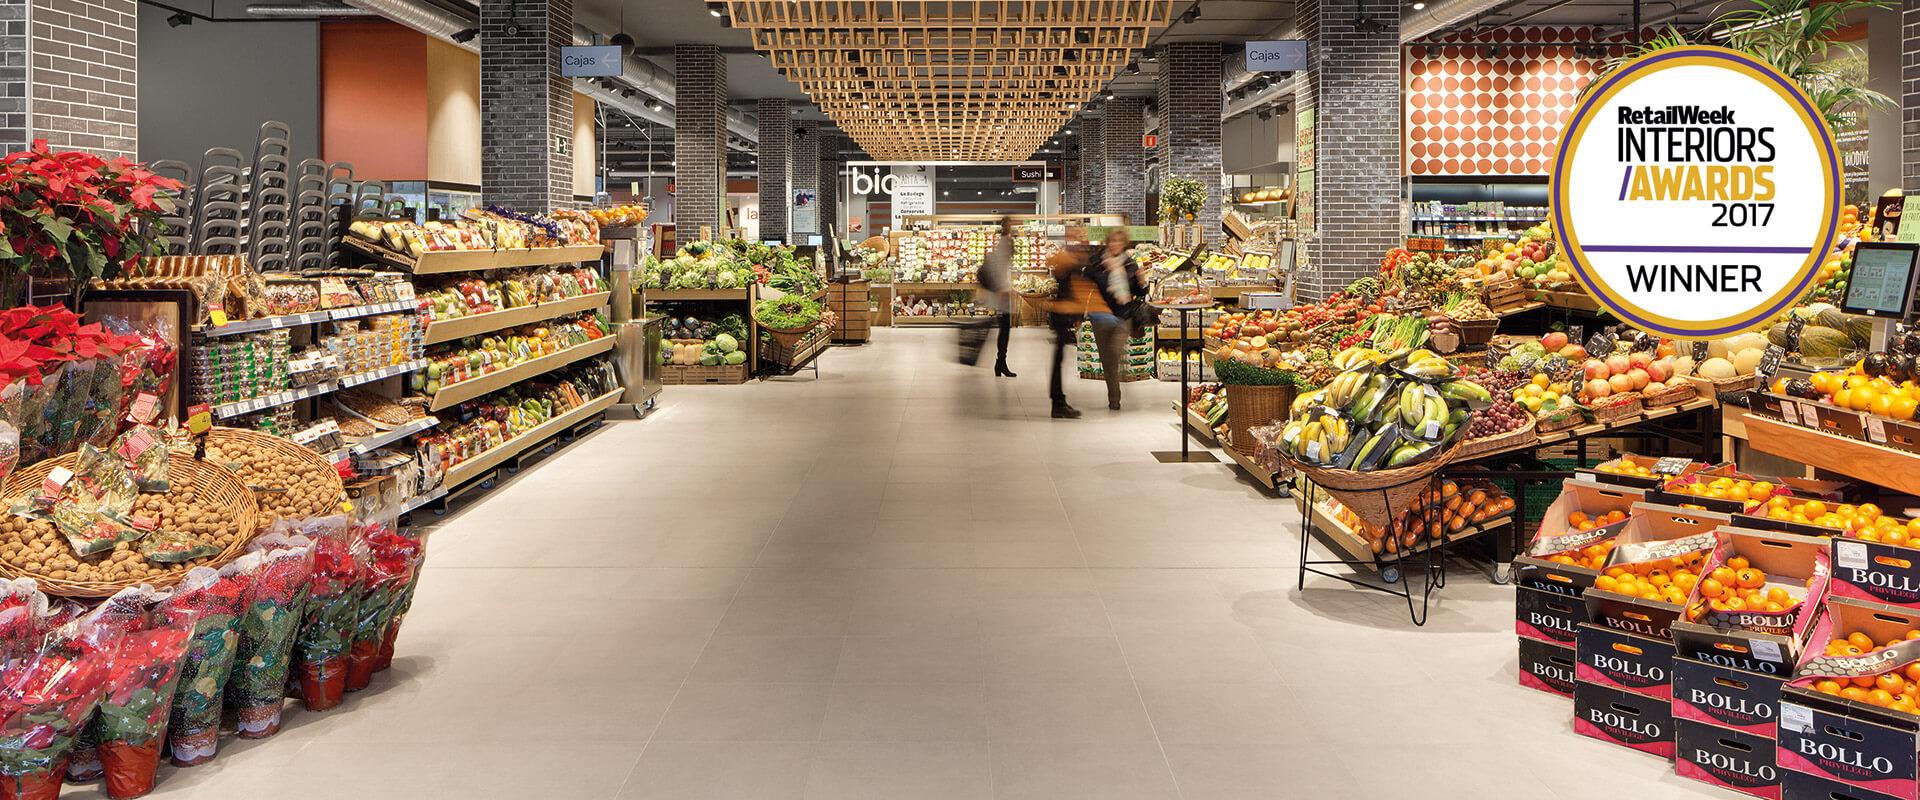 Carrefour Spanien